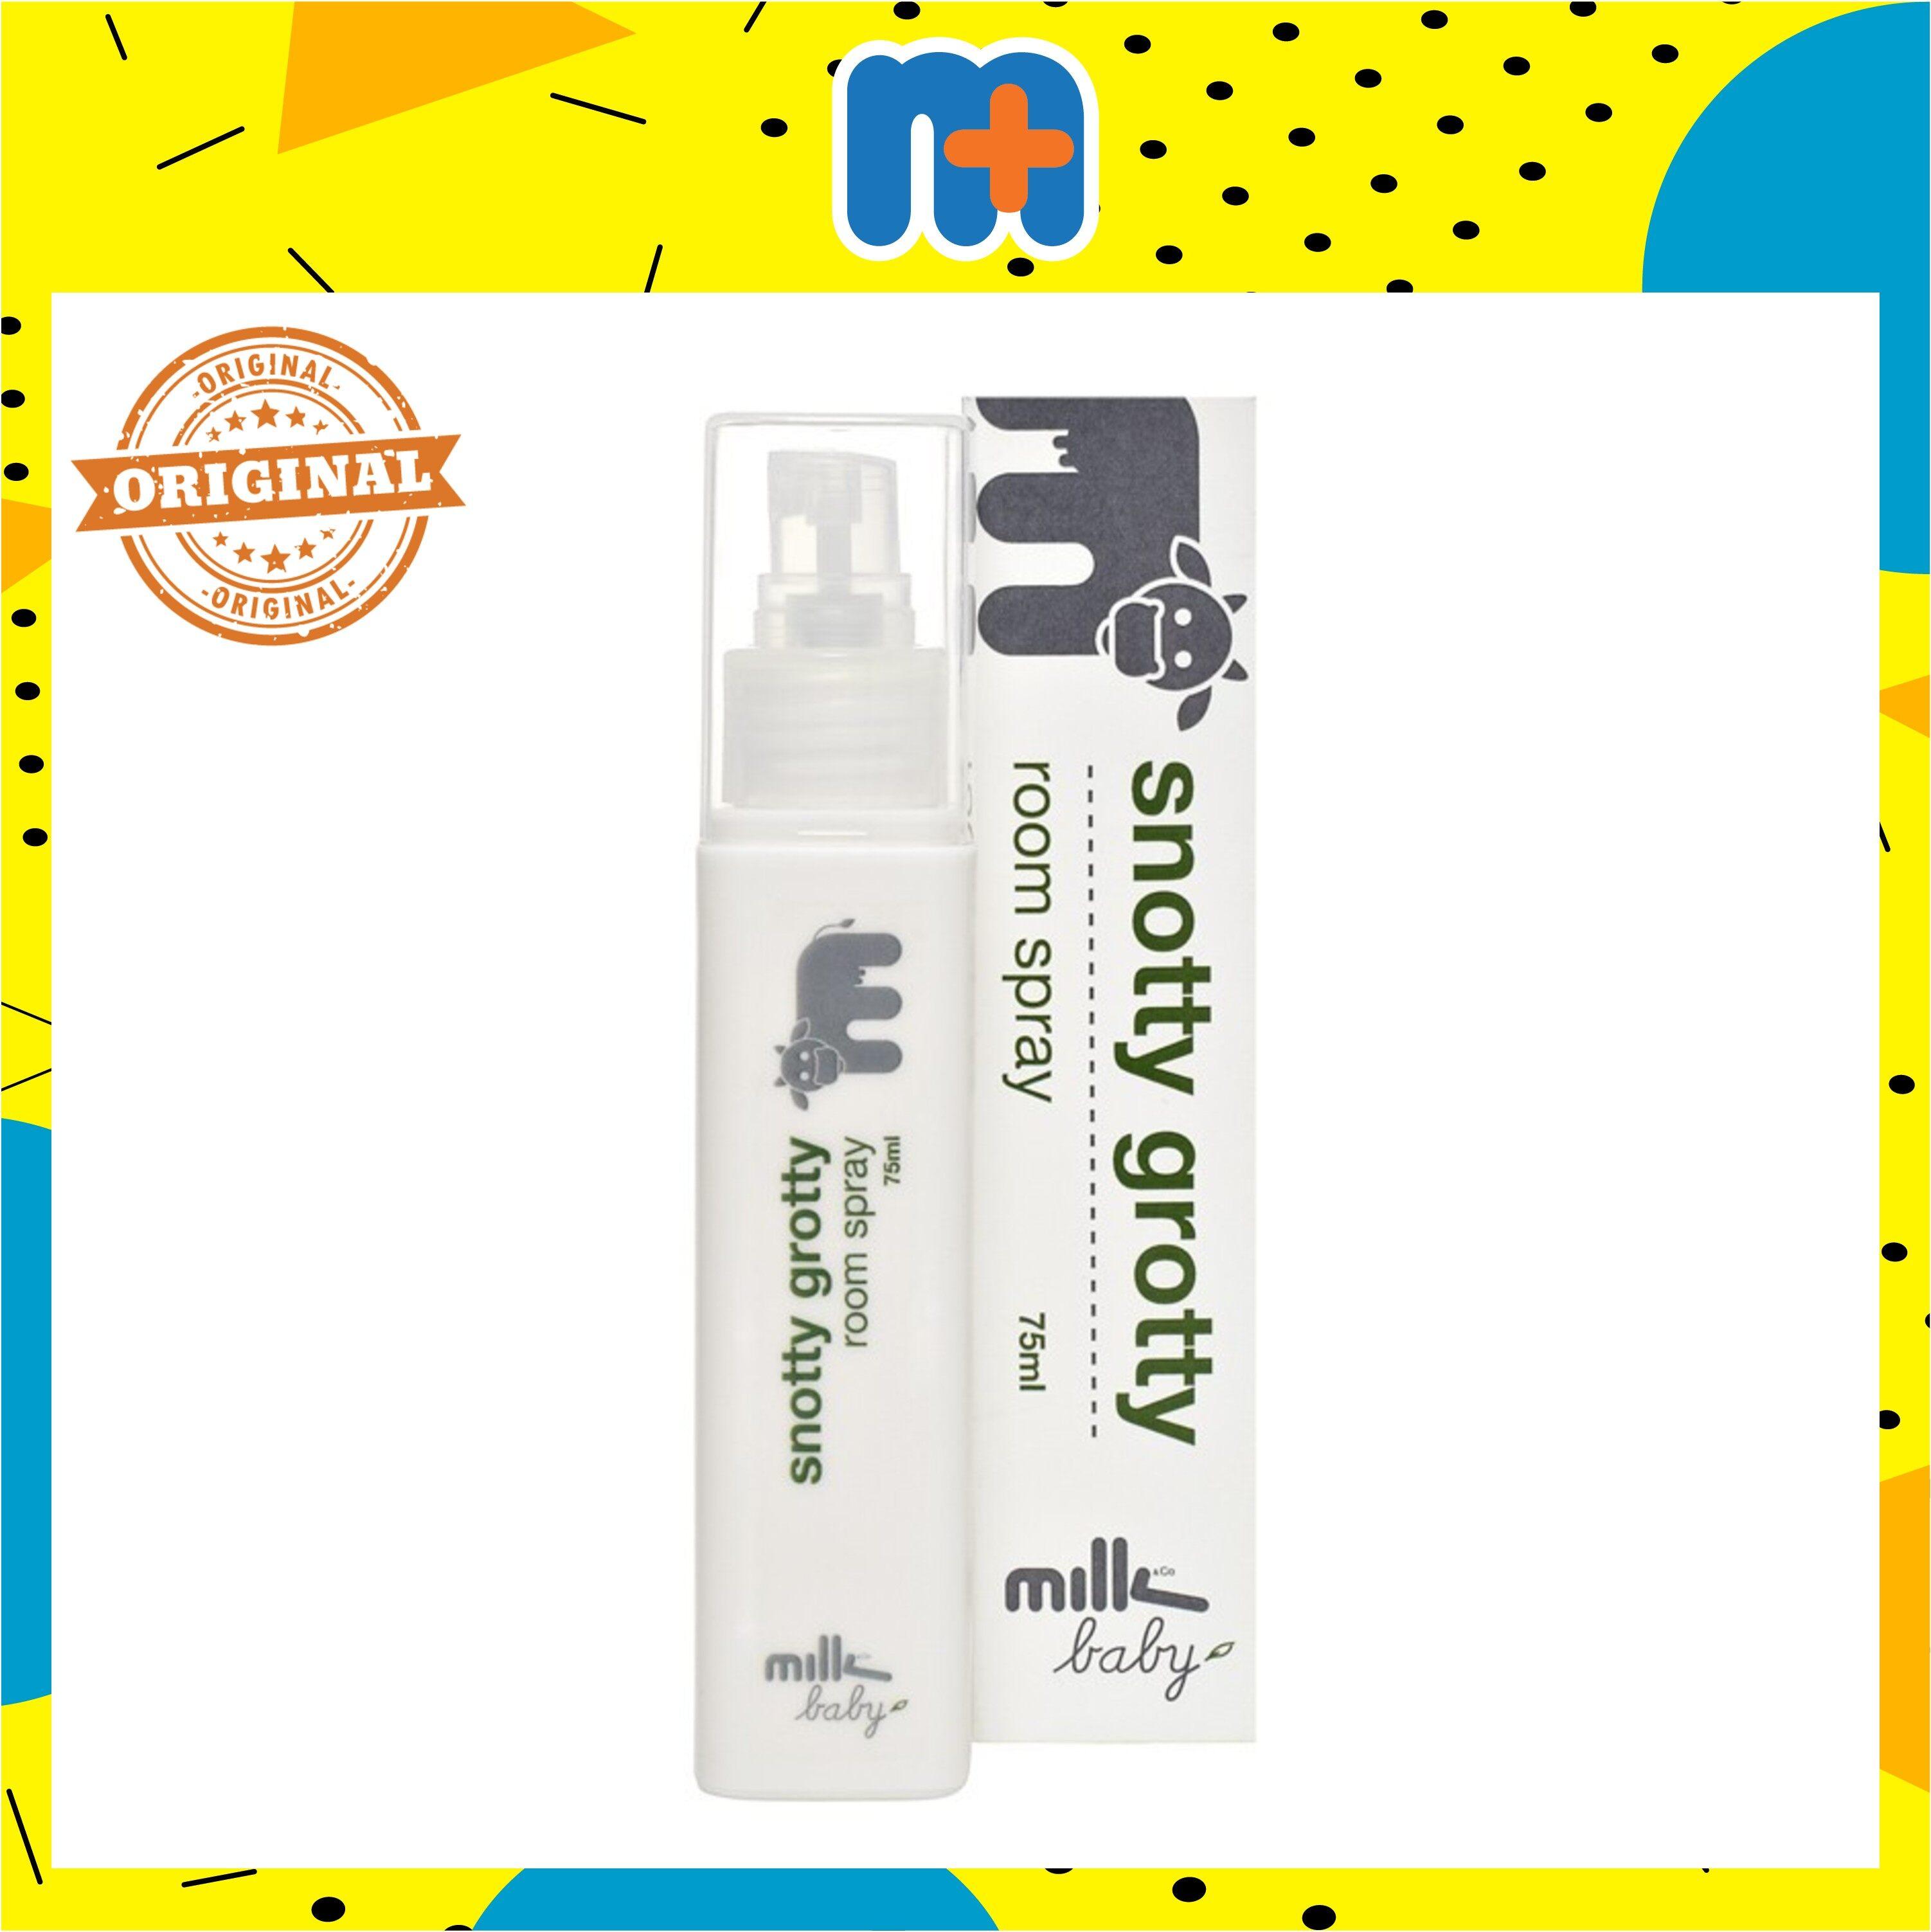 [MPLUS] MILK & CO BABY SNOTTY GROTTY ROOM SPRAY 75ML